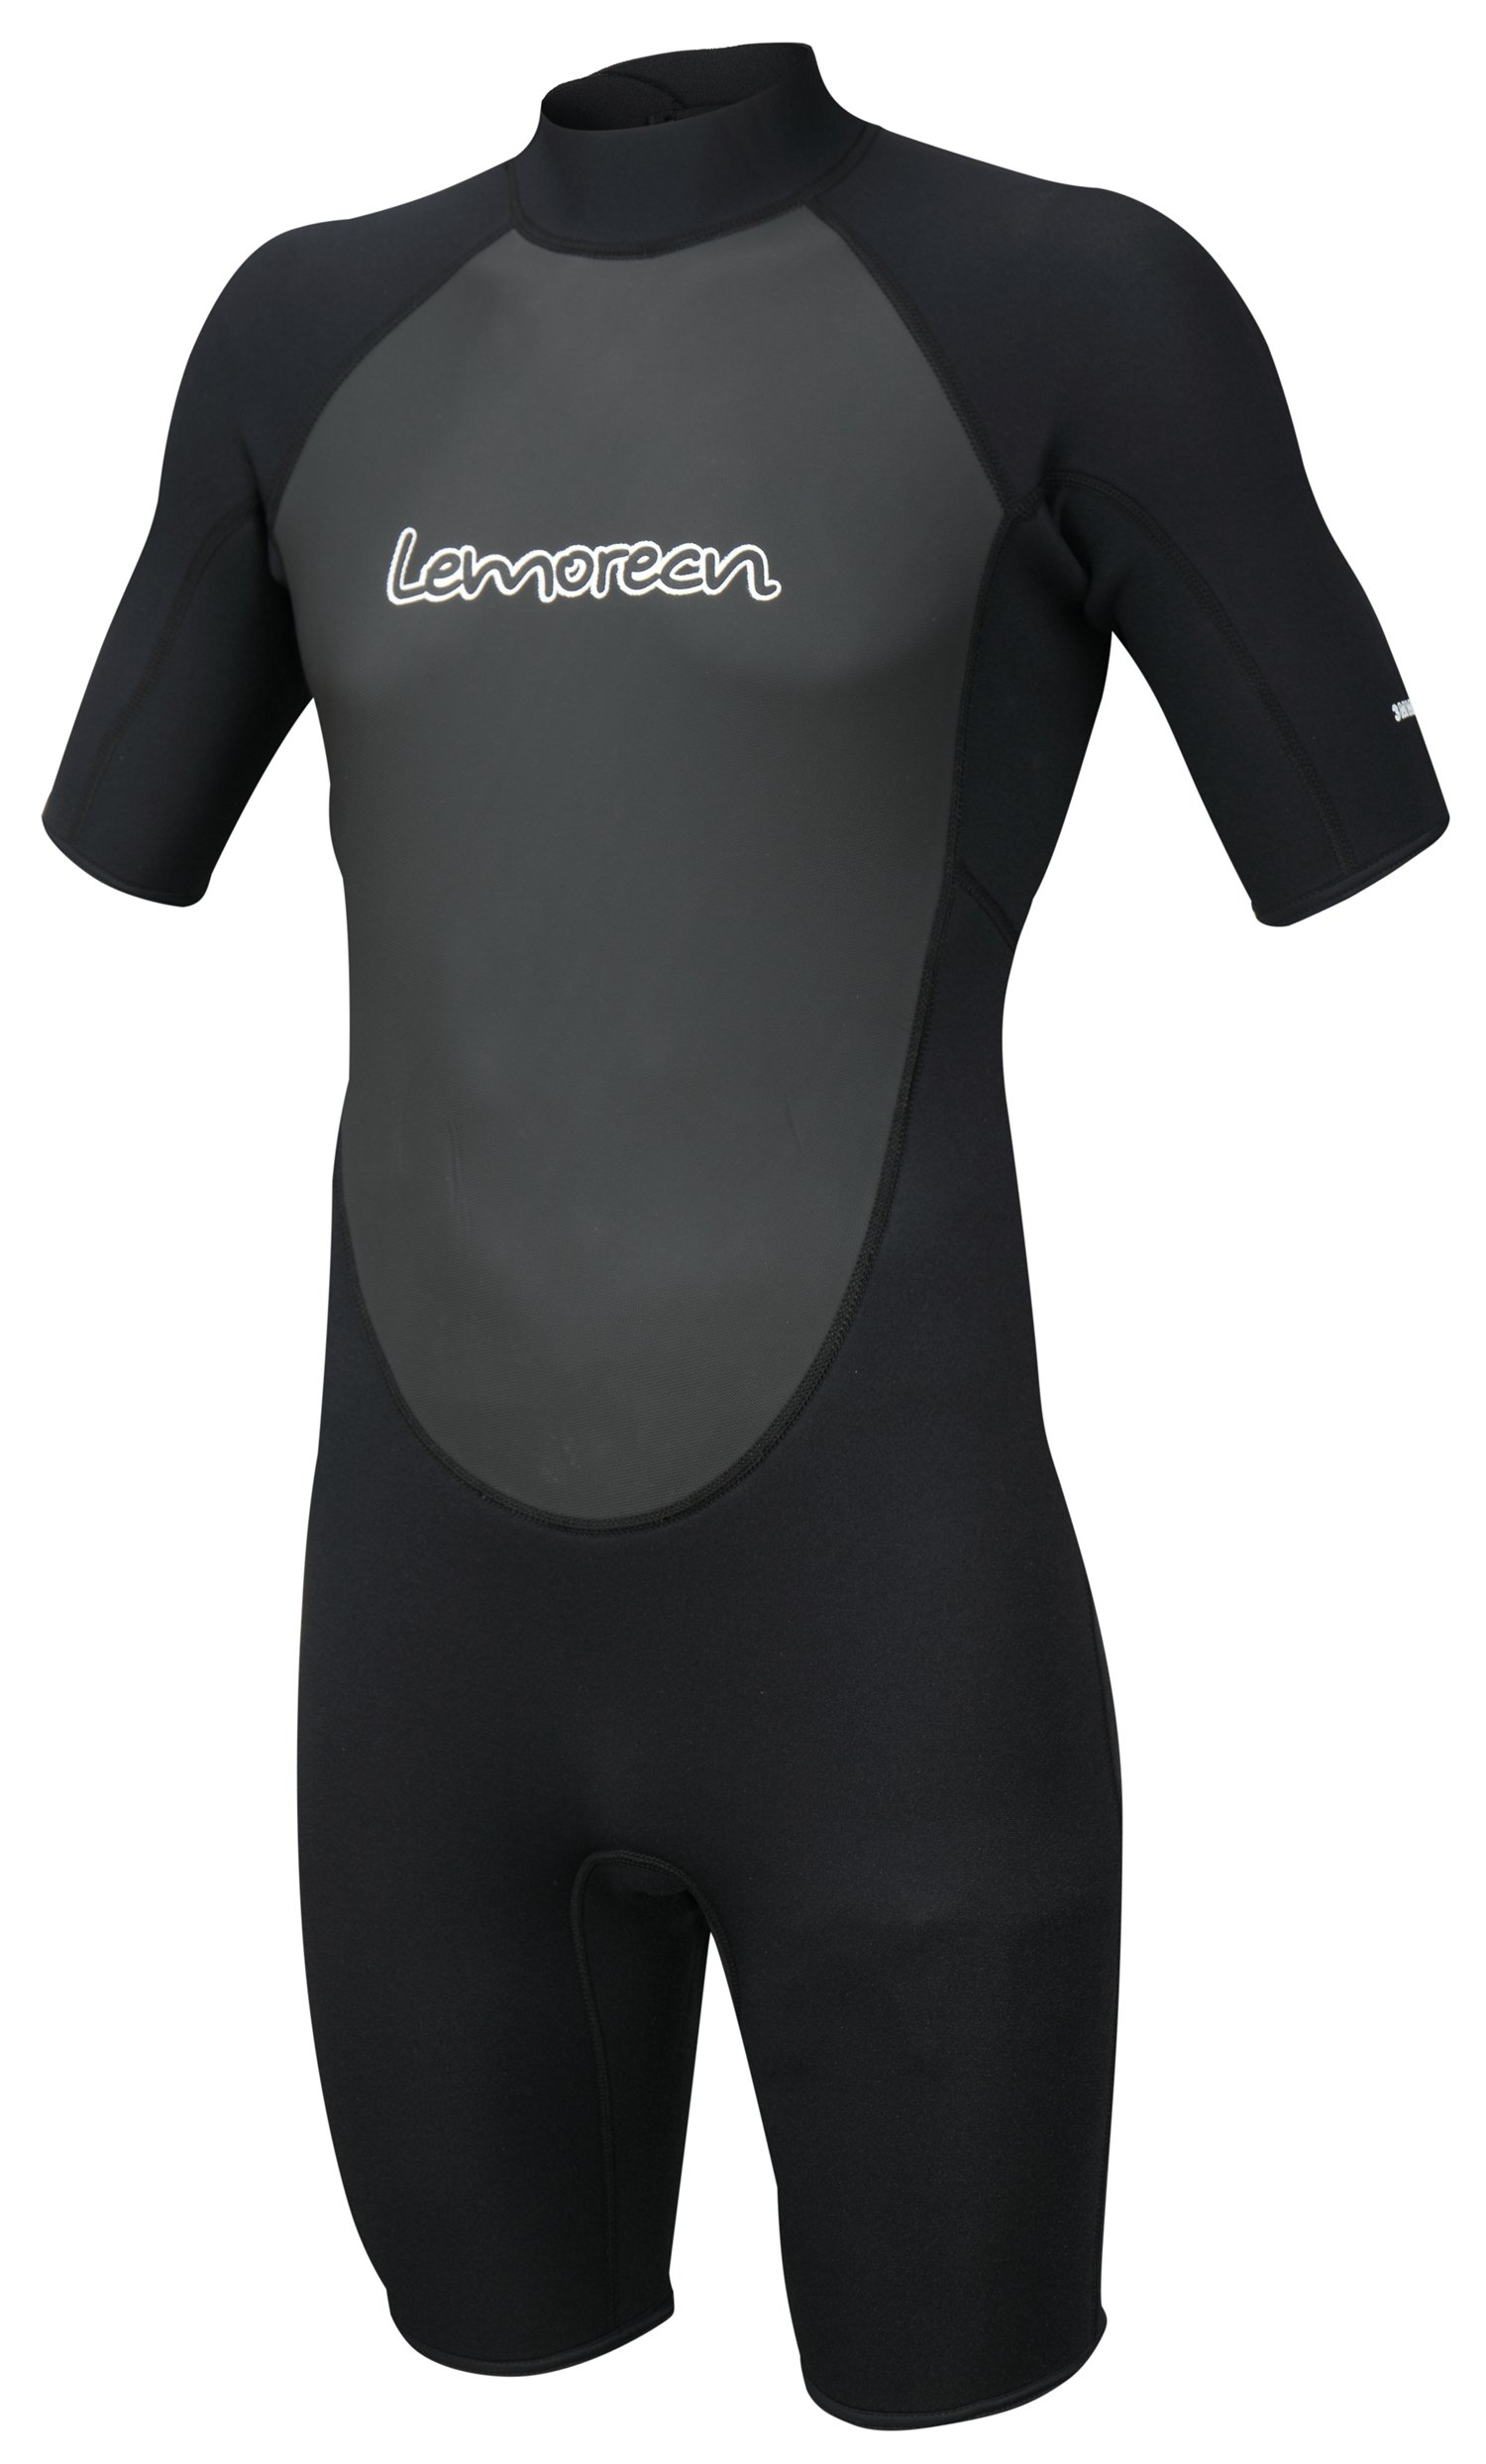 Lemorecn Wetsuits Mens Neoprene 3mm Shorty Diving Suit(3036black-XL) by Lemorecn